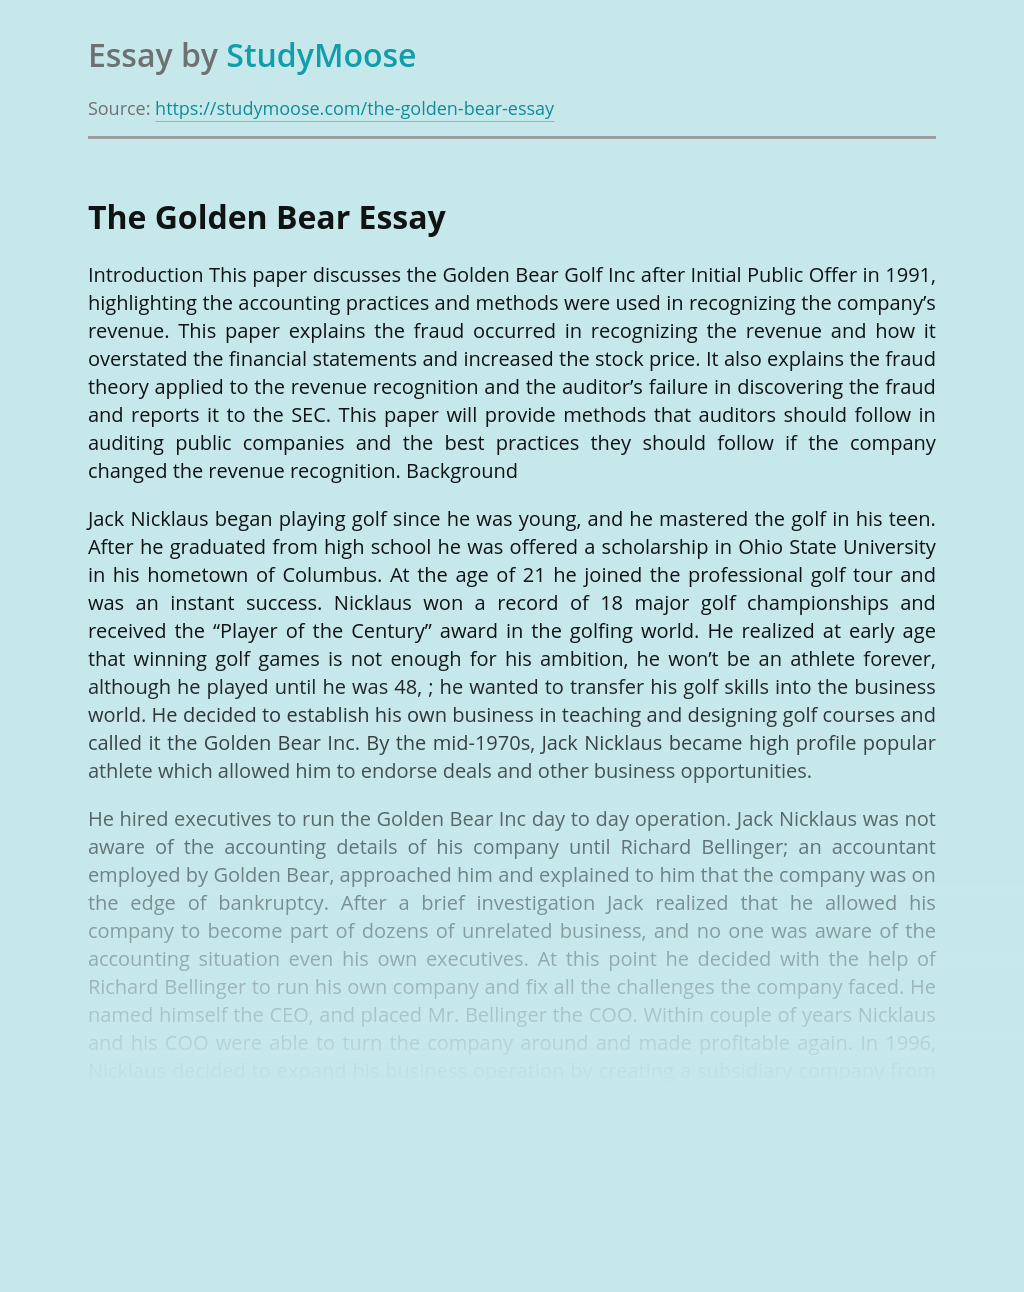 The Golden Bear after Initial Public Offer